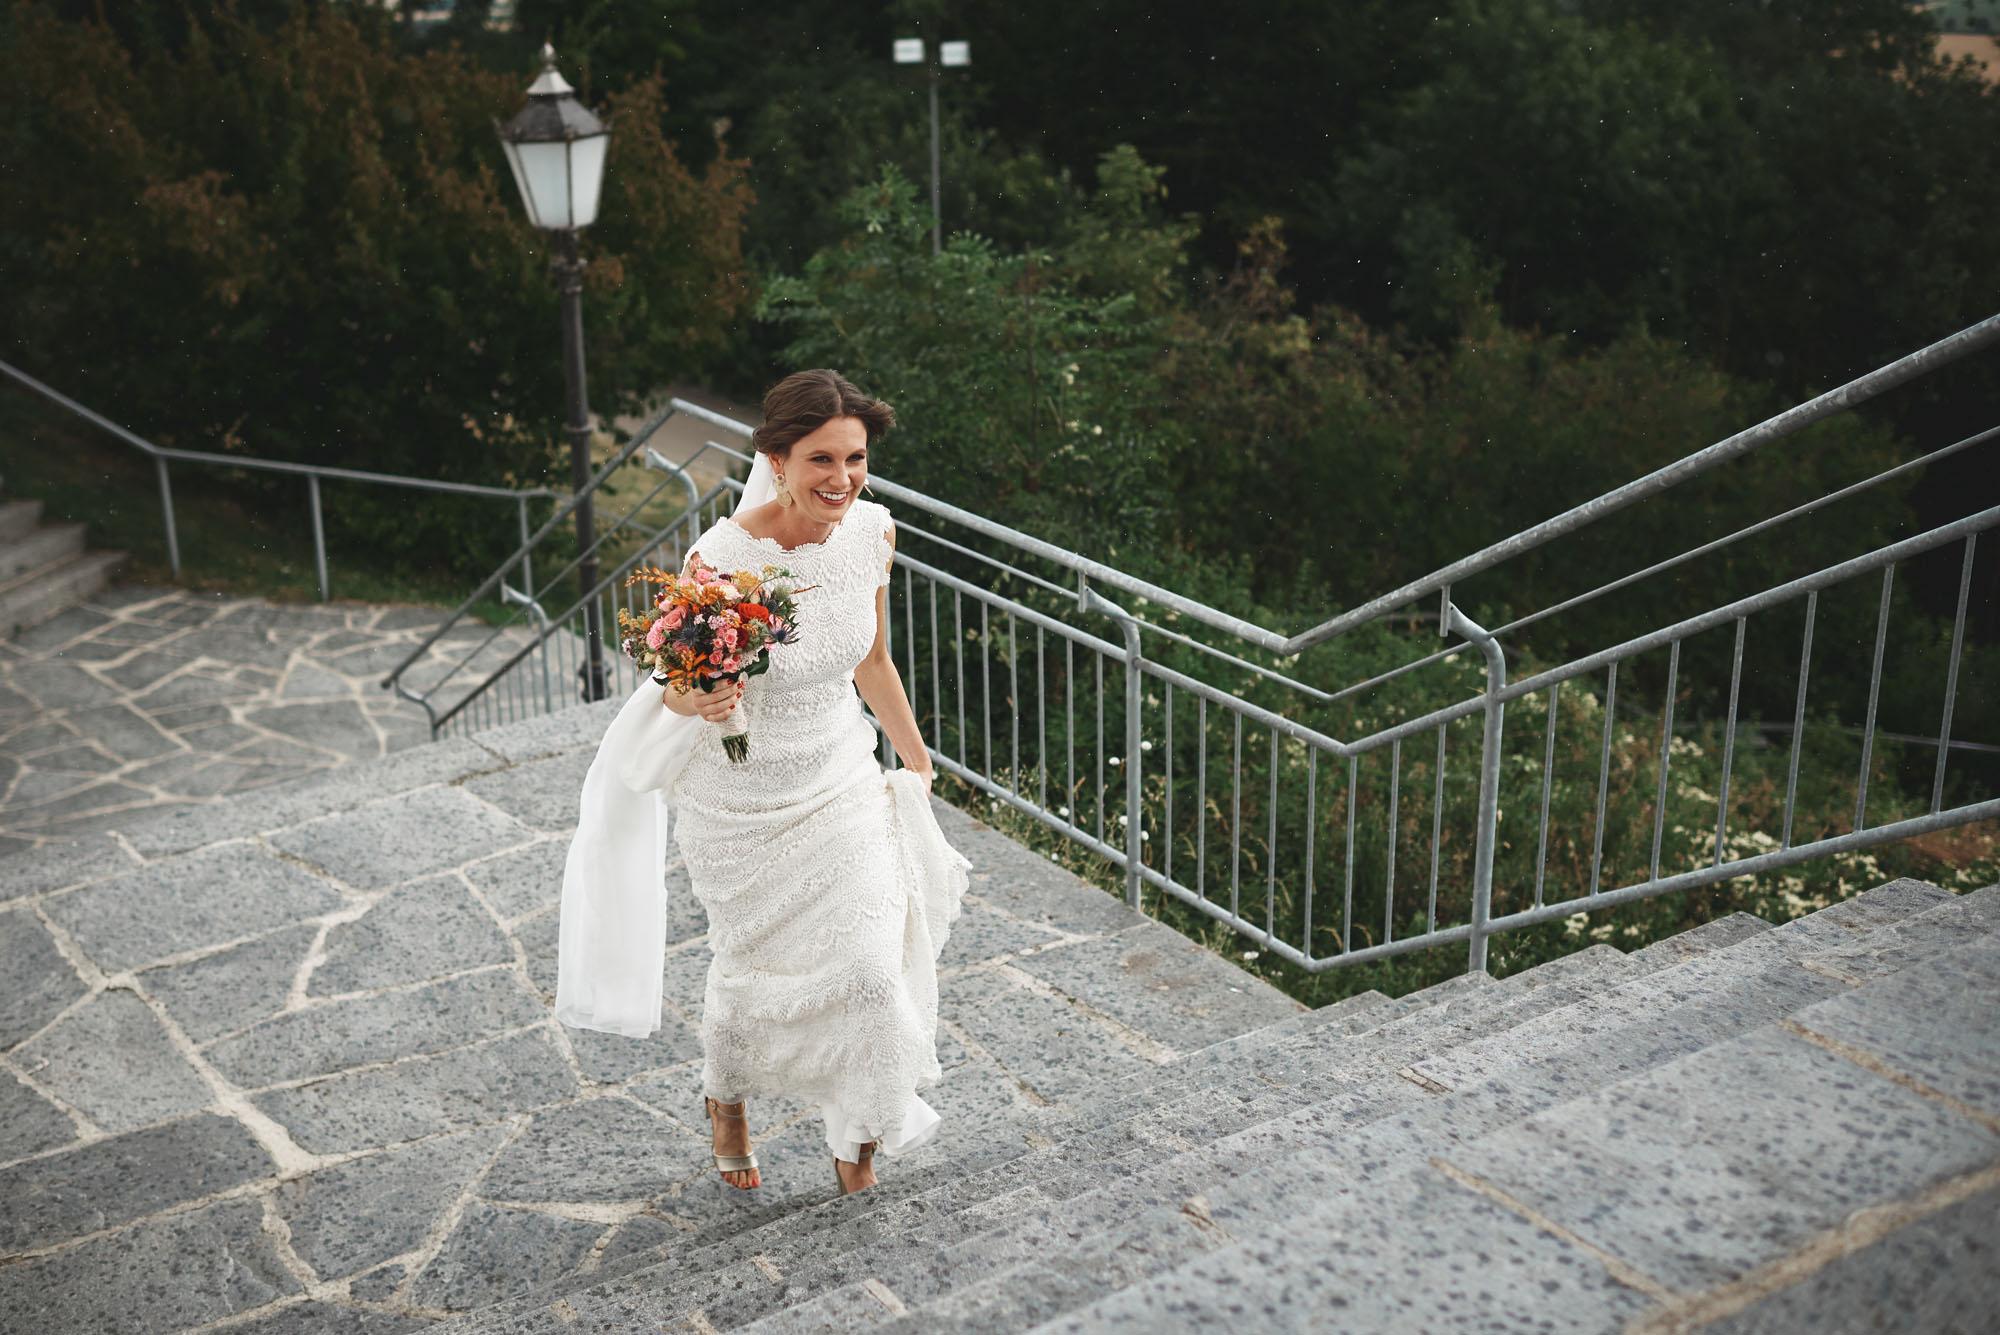 Martin Spoerl Potography Hochzeit Ailinger Muehle 0013